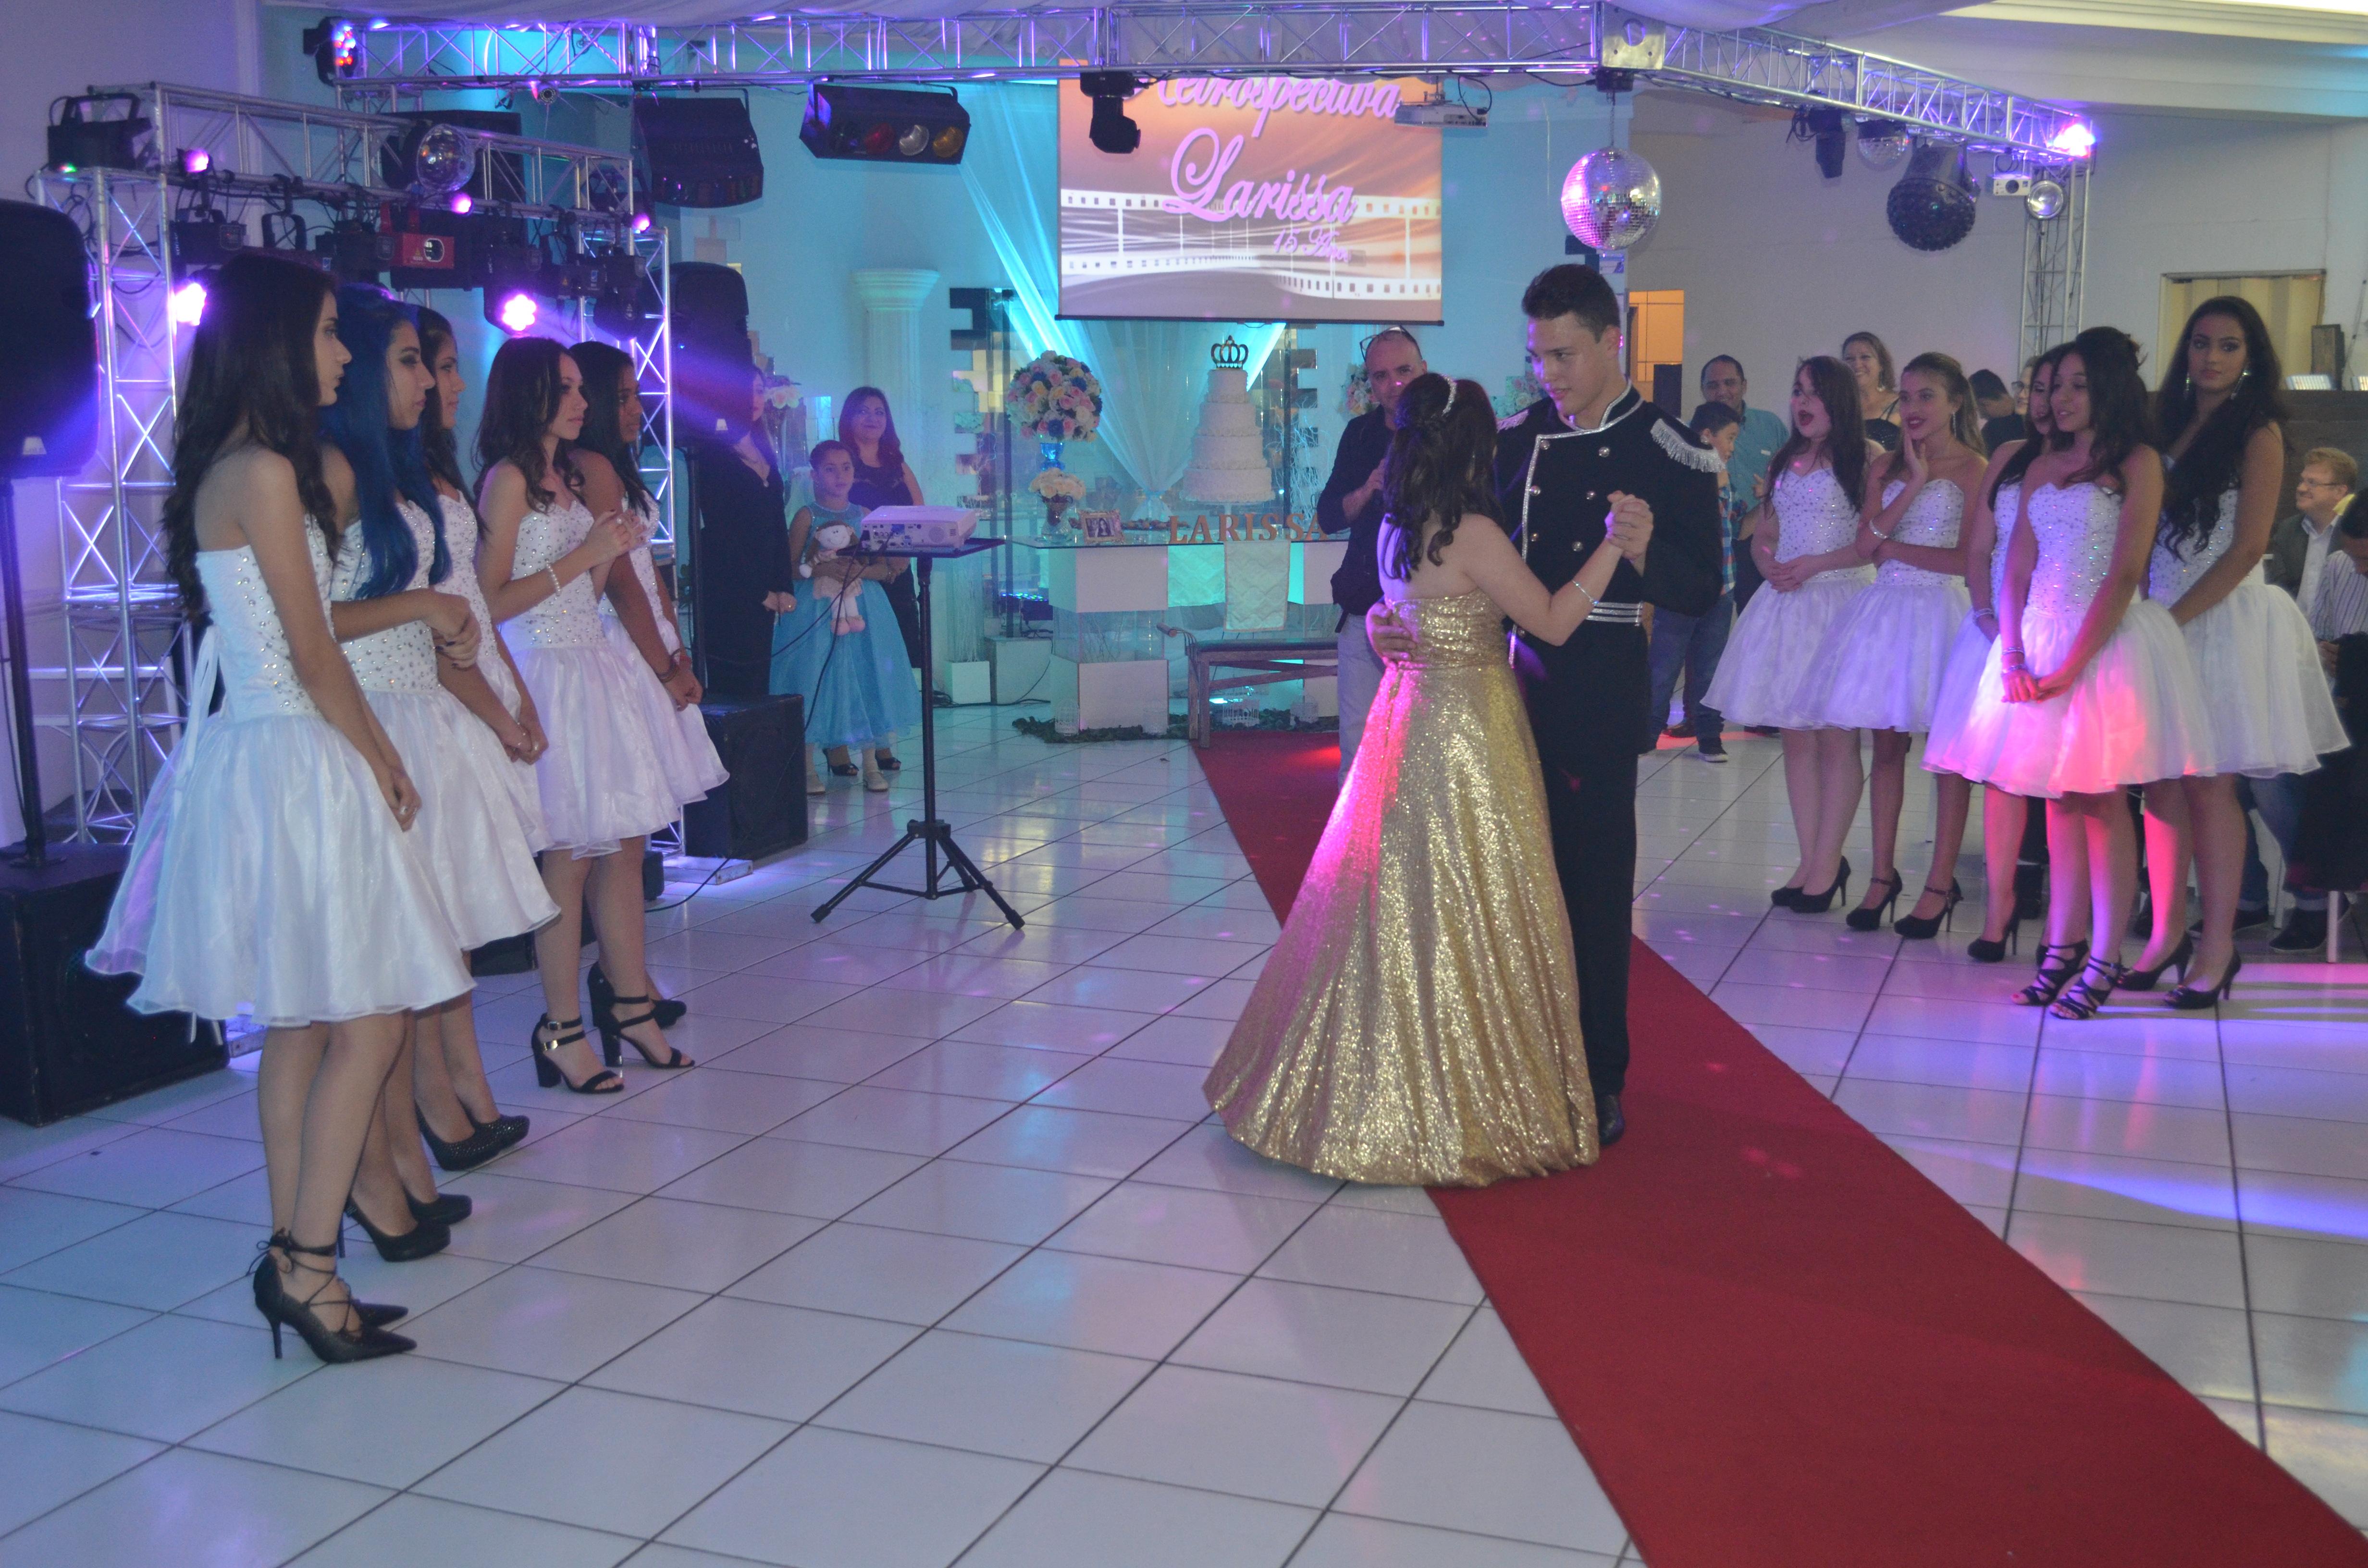 DSC_1152-Valsa Debutante, Buffet Candy Eventos